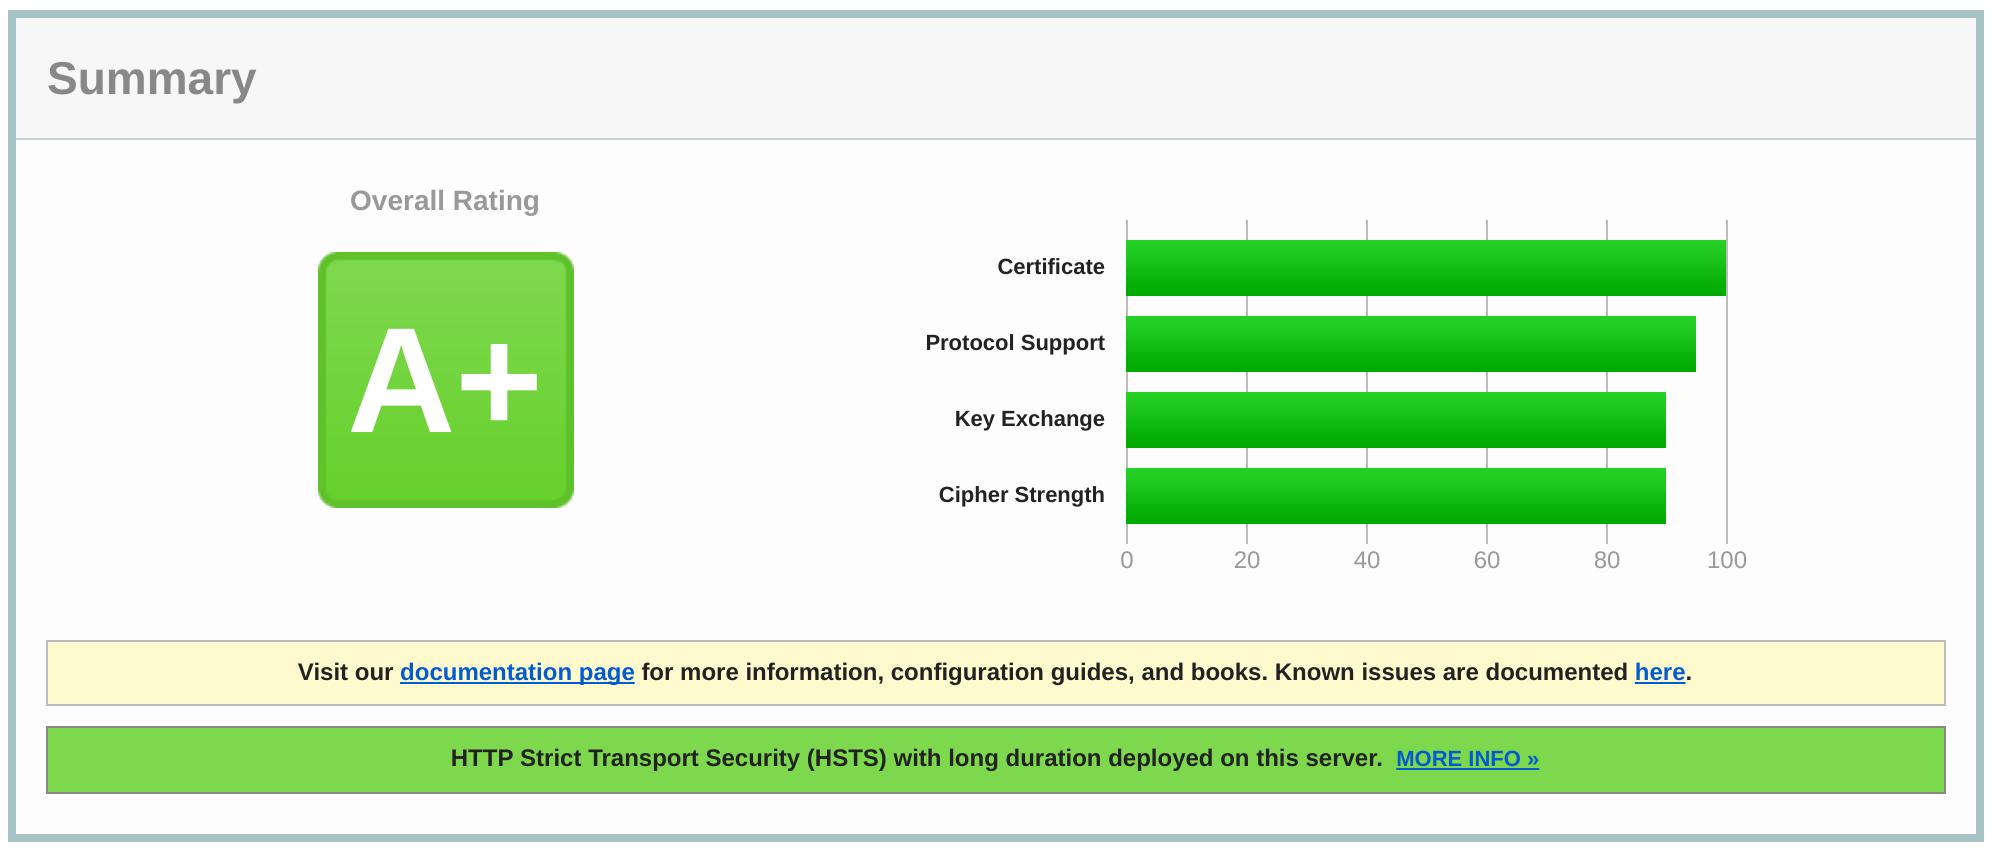 SSL labs results